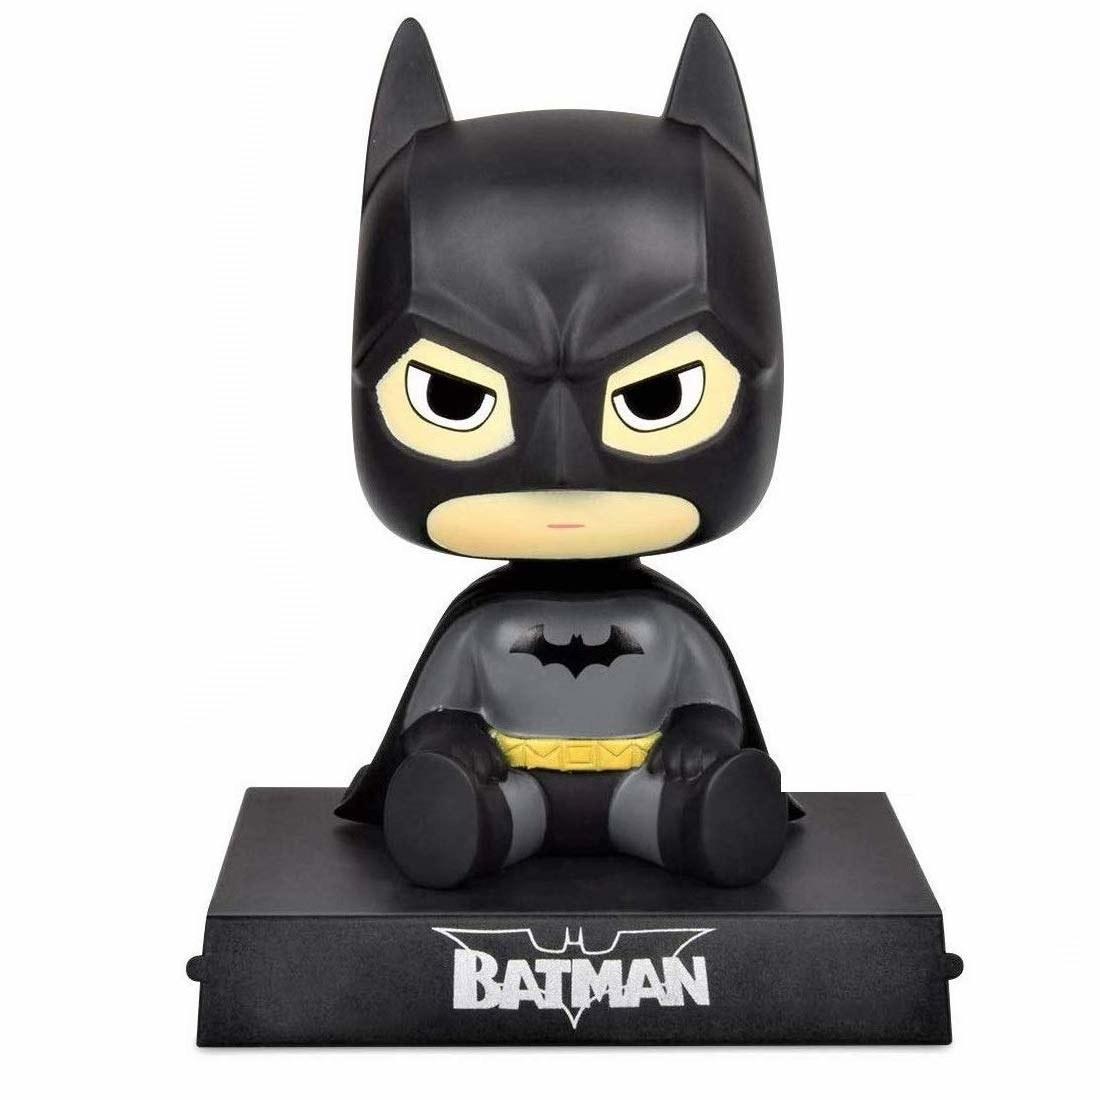 A Batman bobble head phone holder